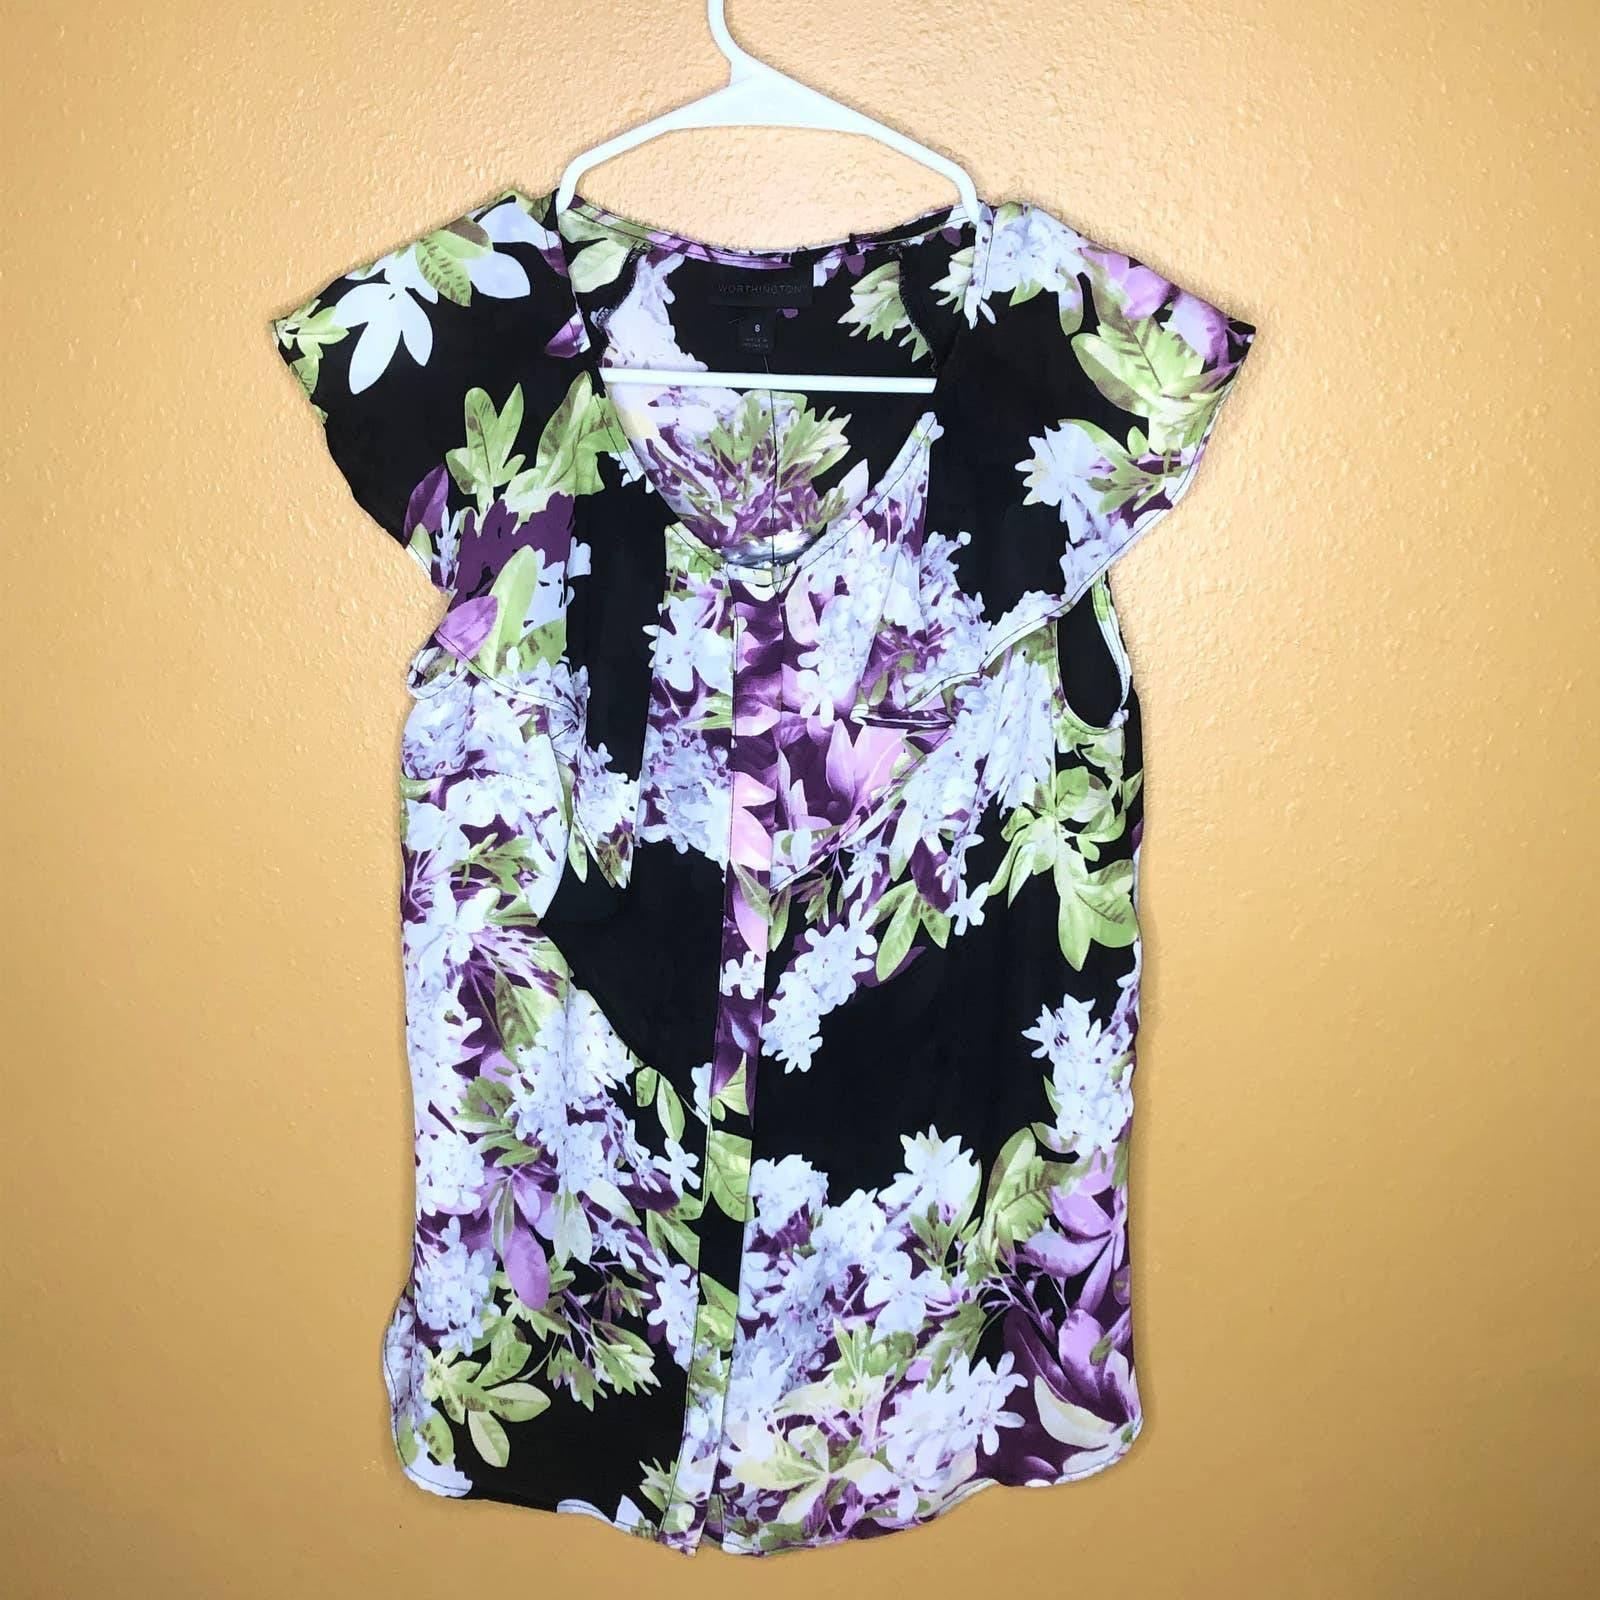 Worthington Sheer Floral Ruffle Blouse S